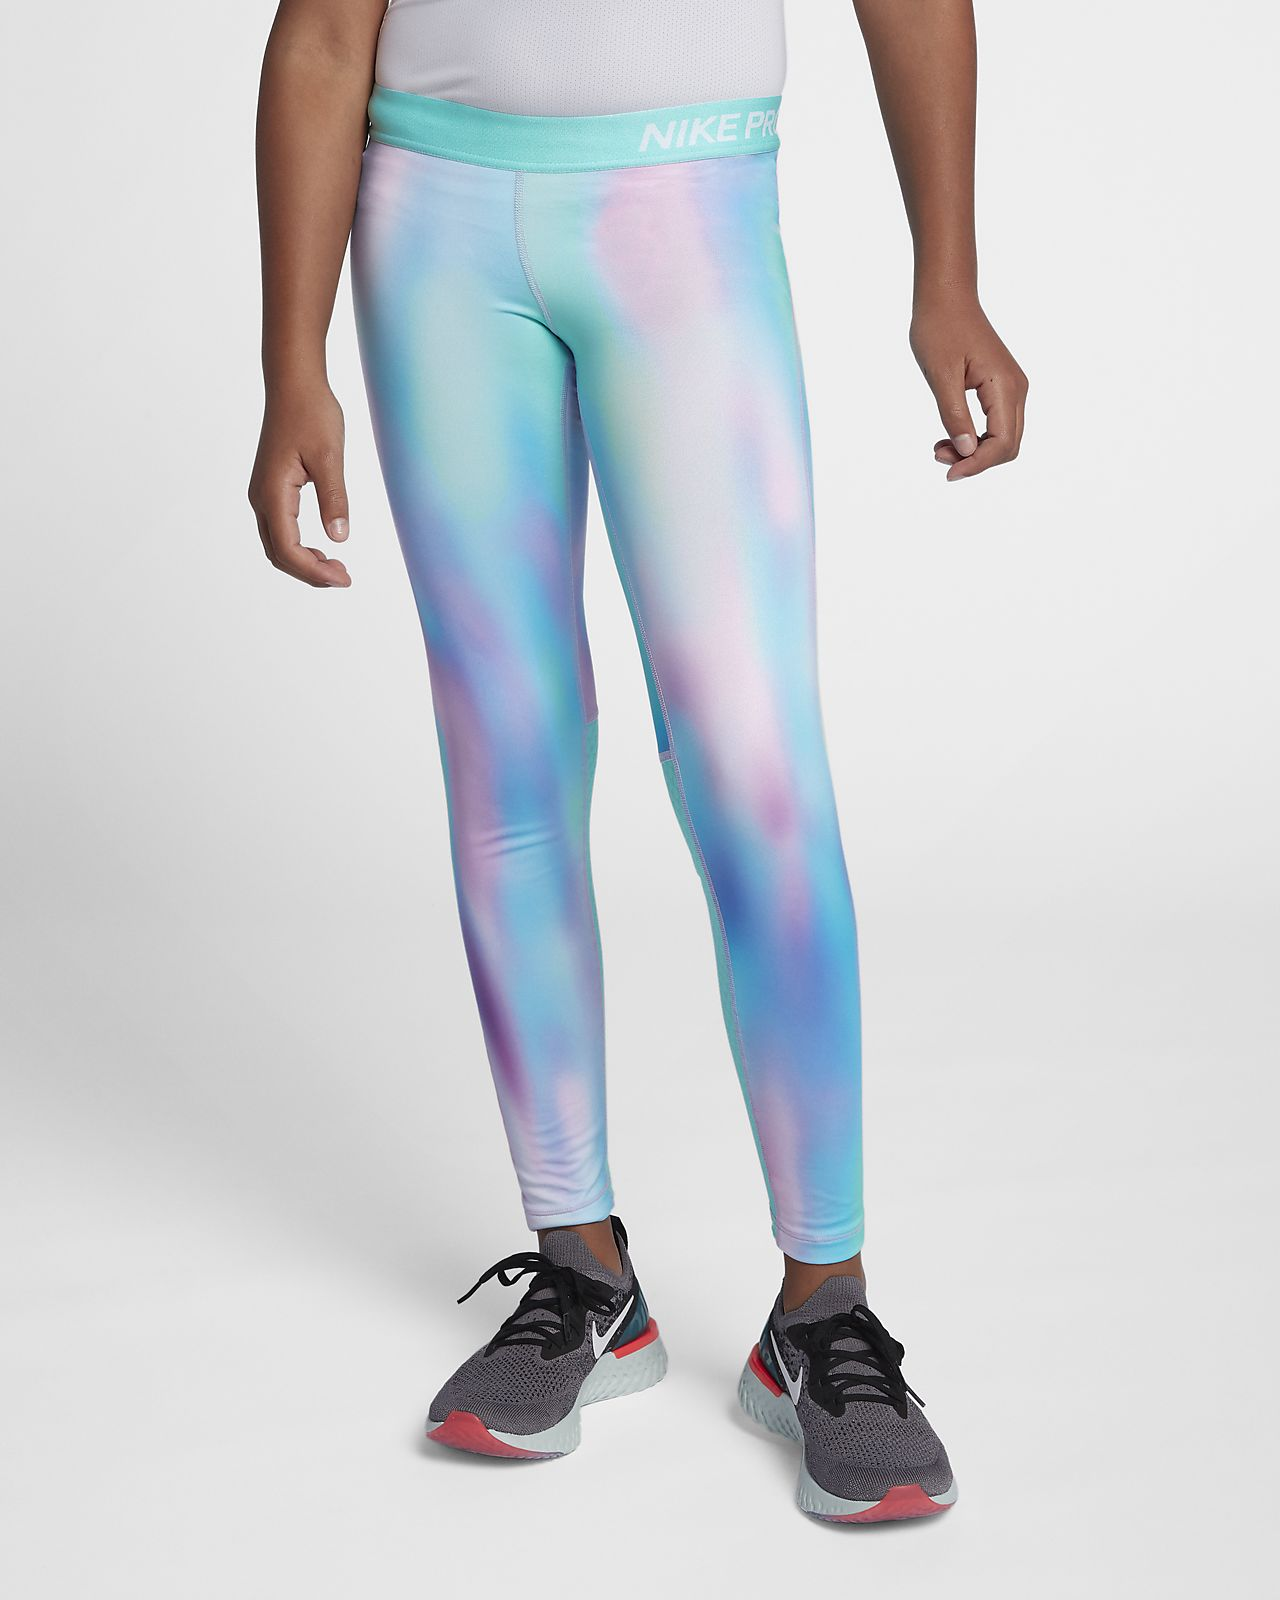 Nike Pro Warm Girls' Printed Tights